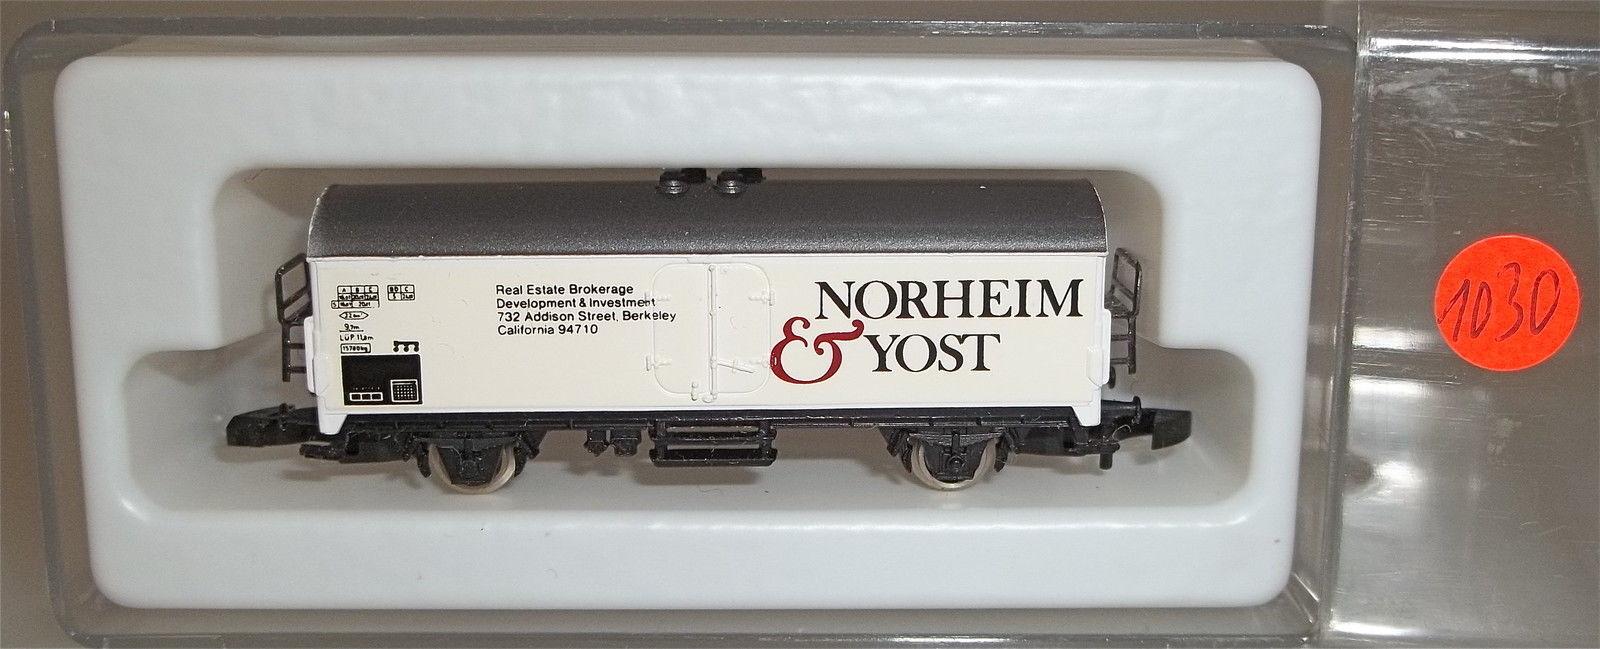 Norheim e Yost partire 897   8600 Traccia Z 1:220 1030 å